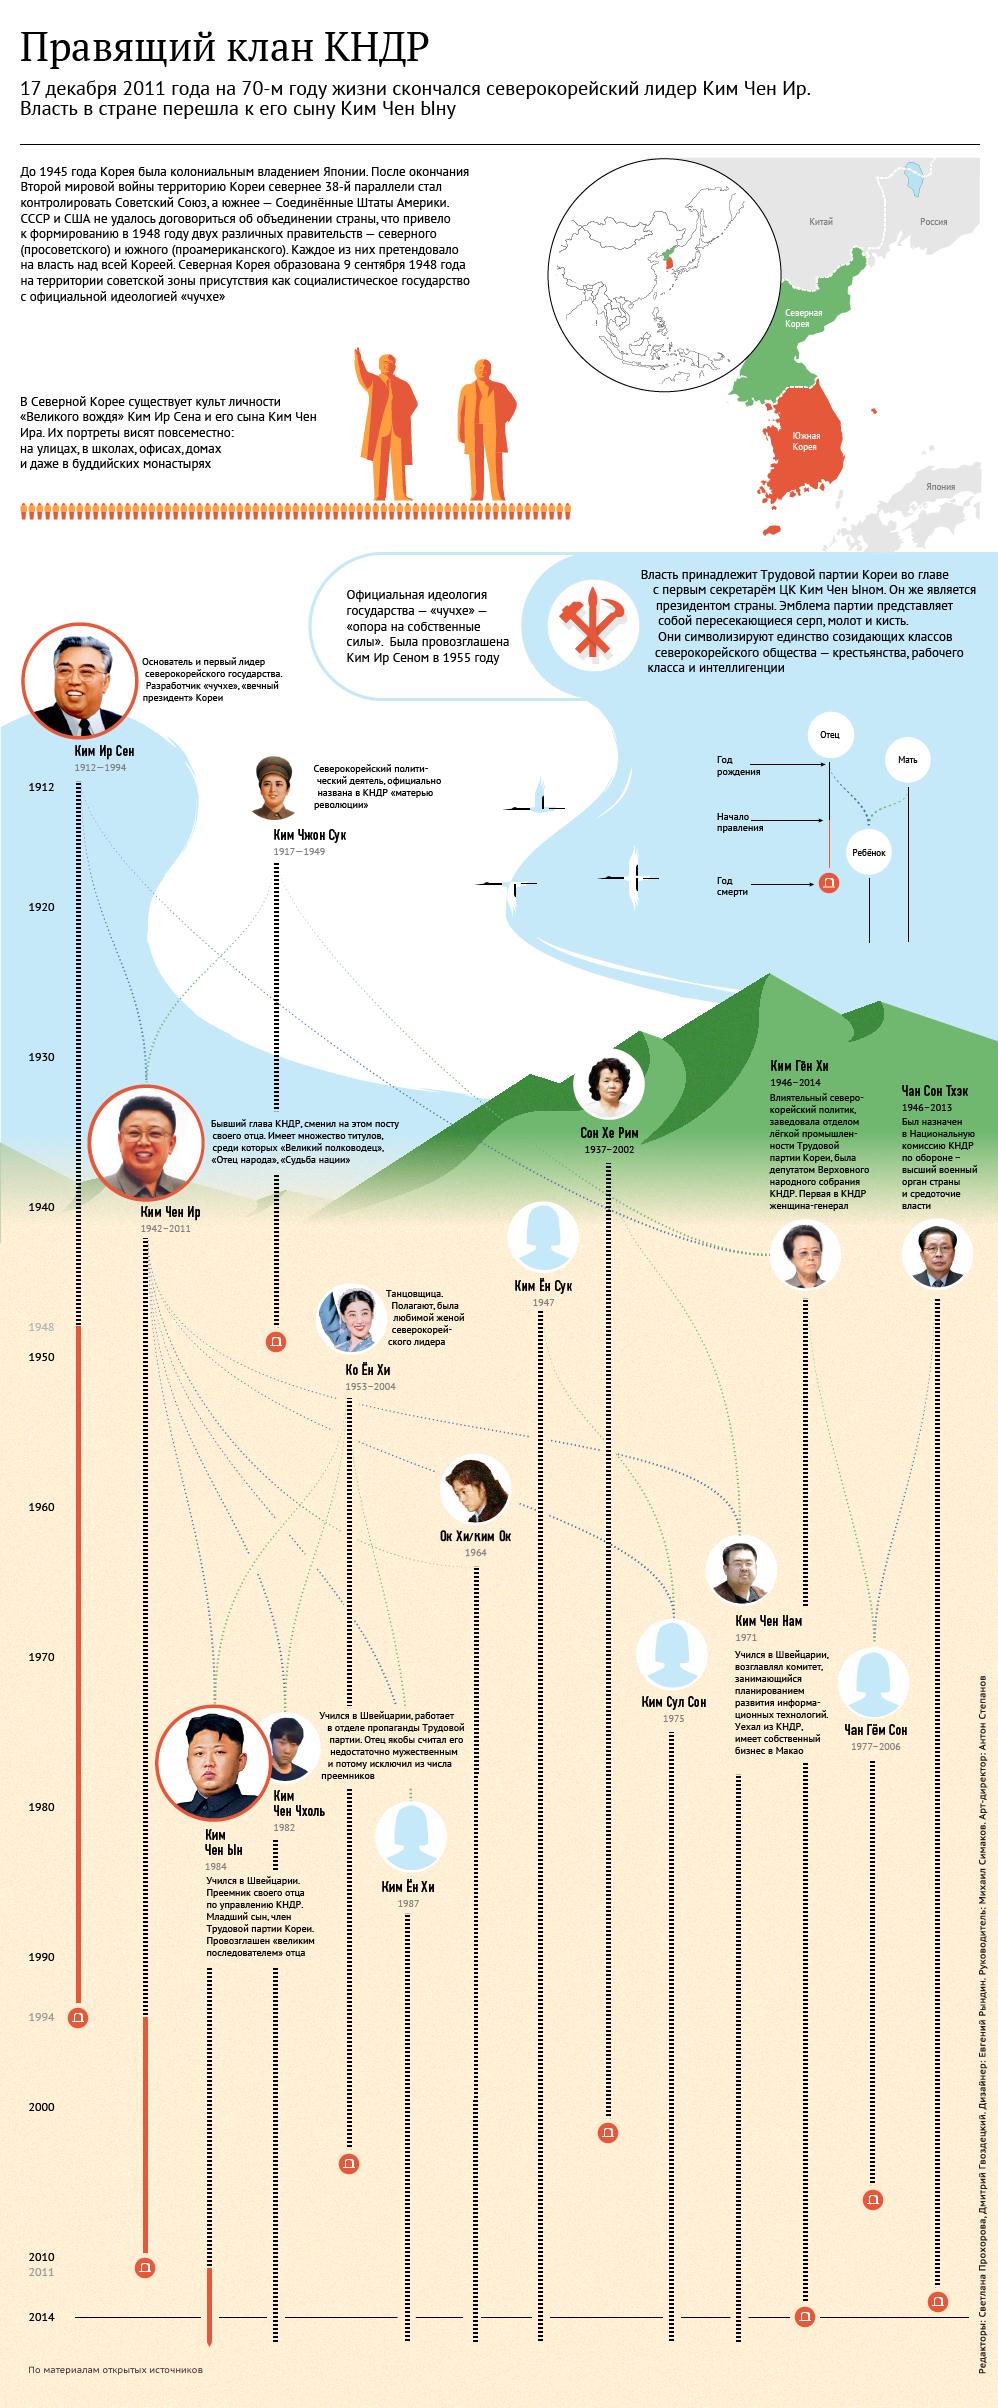 Правящий клан КНДР. Инфографика